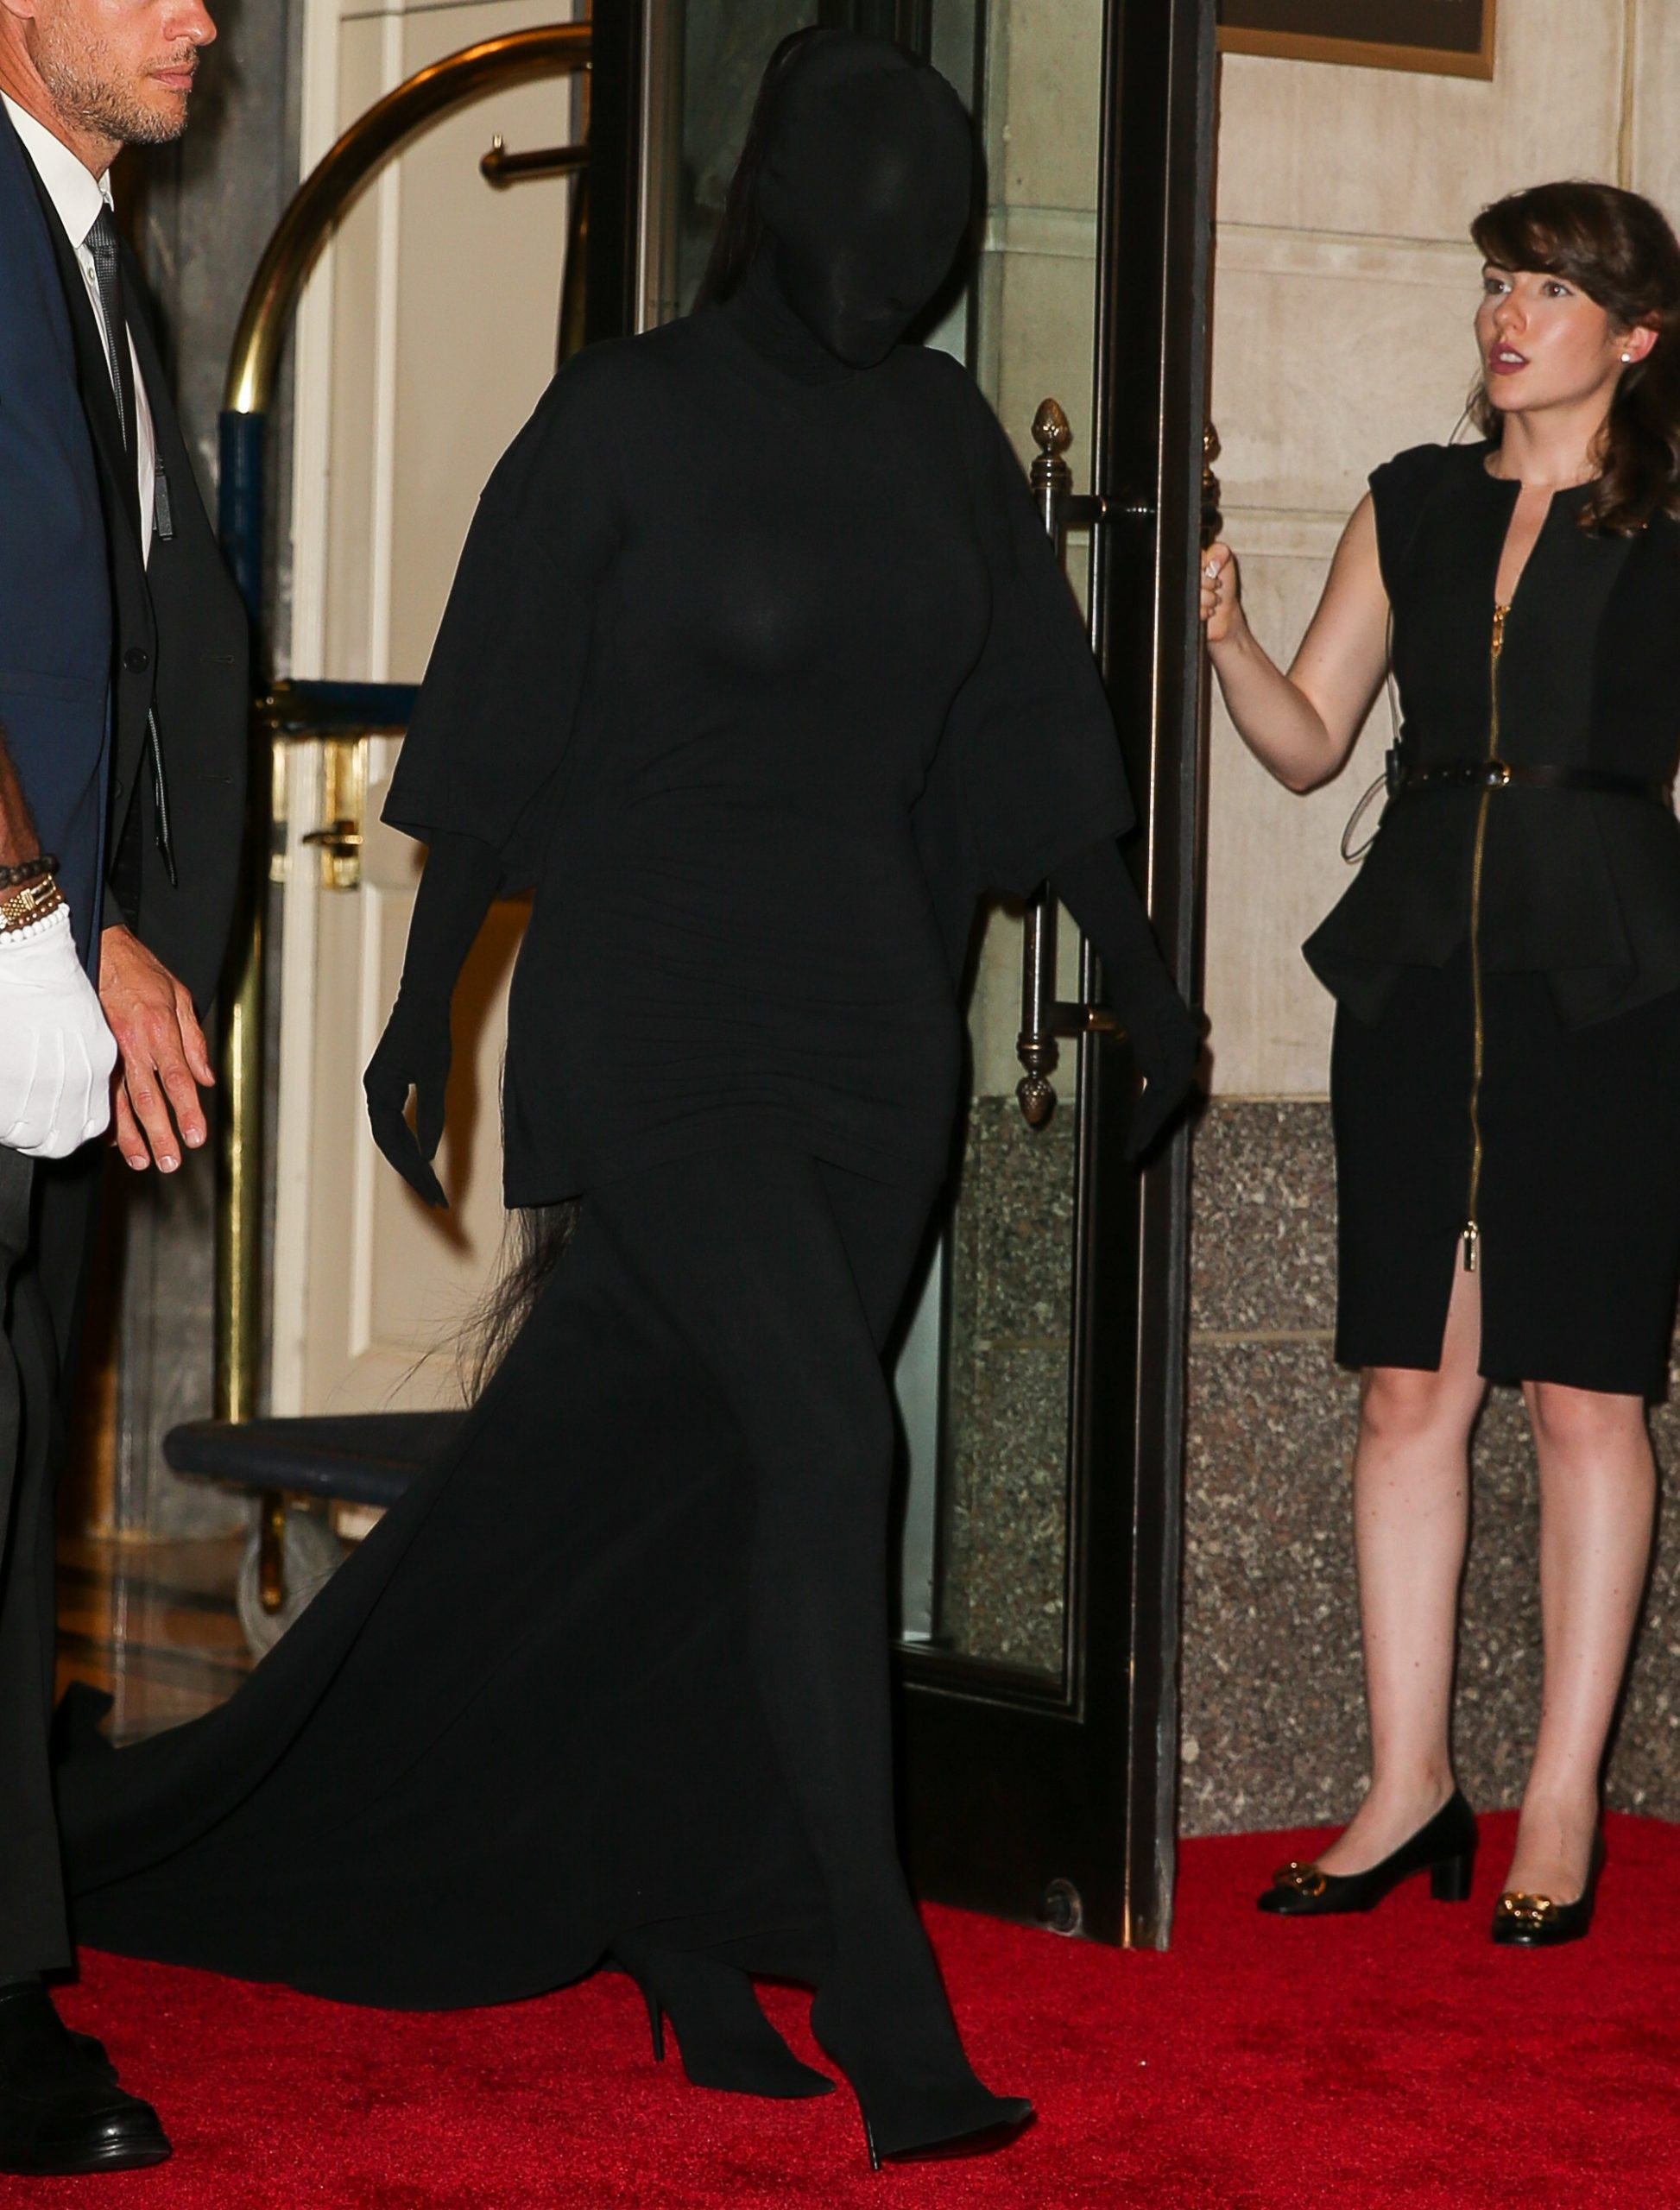 Kim Kardashian wears a head to toe Balenciaga ensemble for the Met Gala 2021